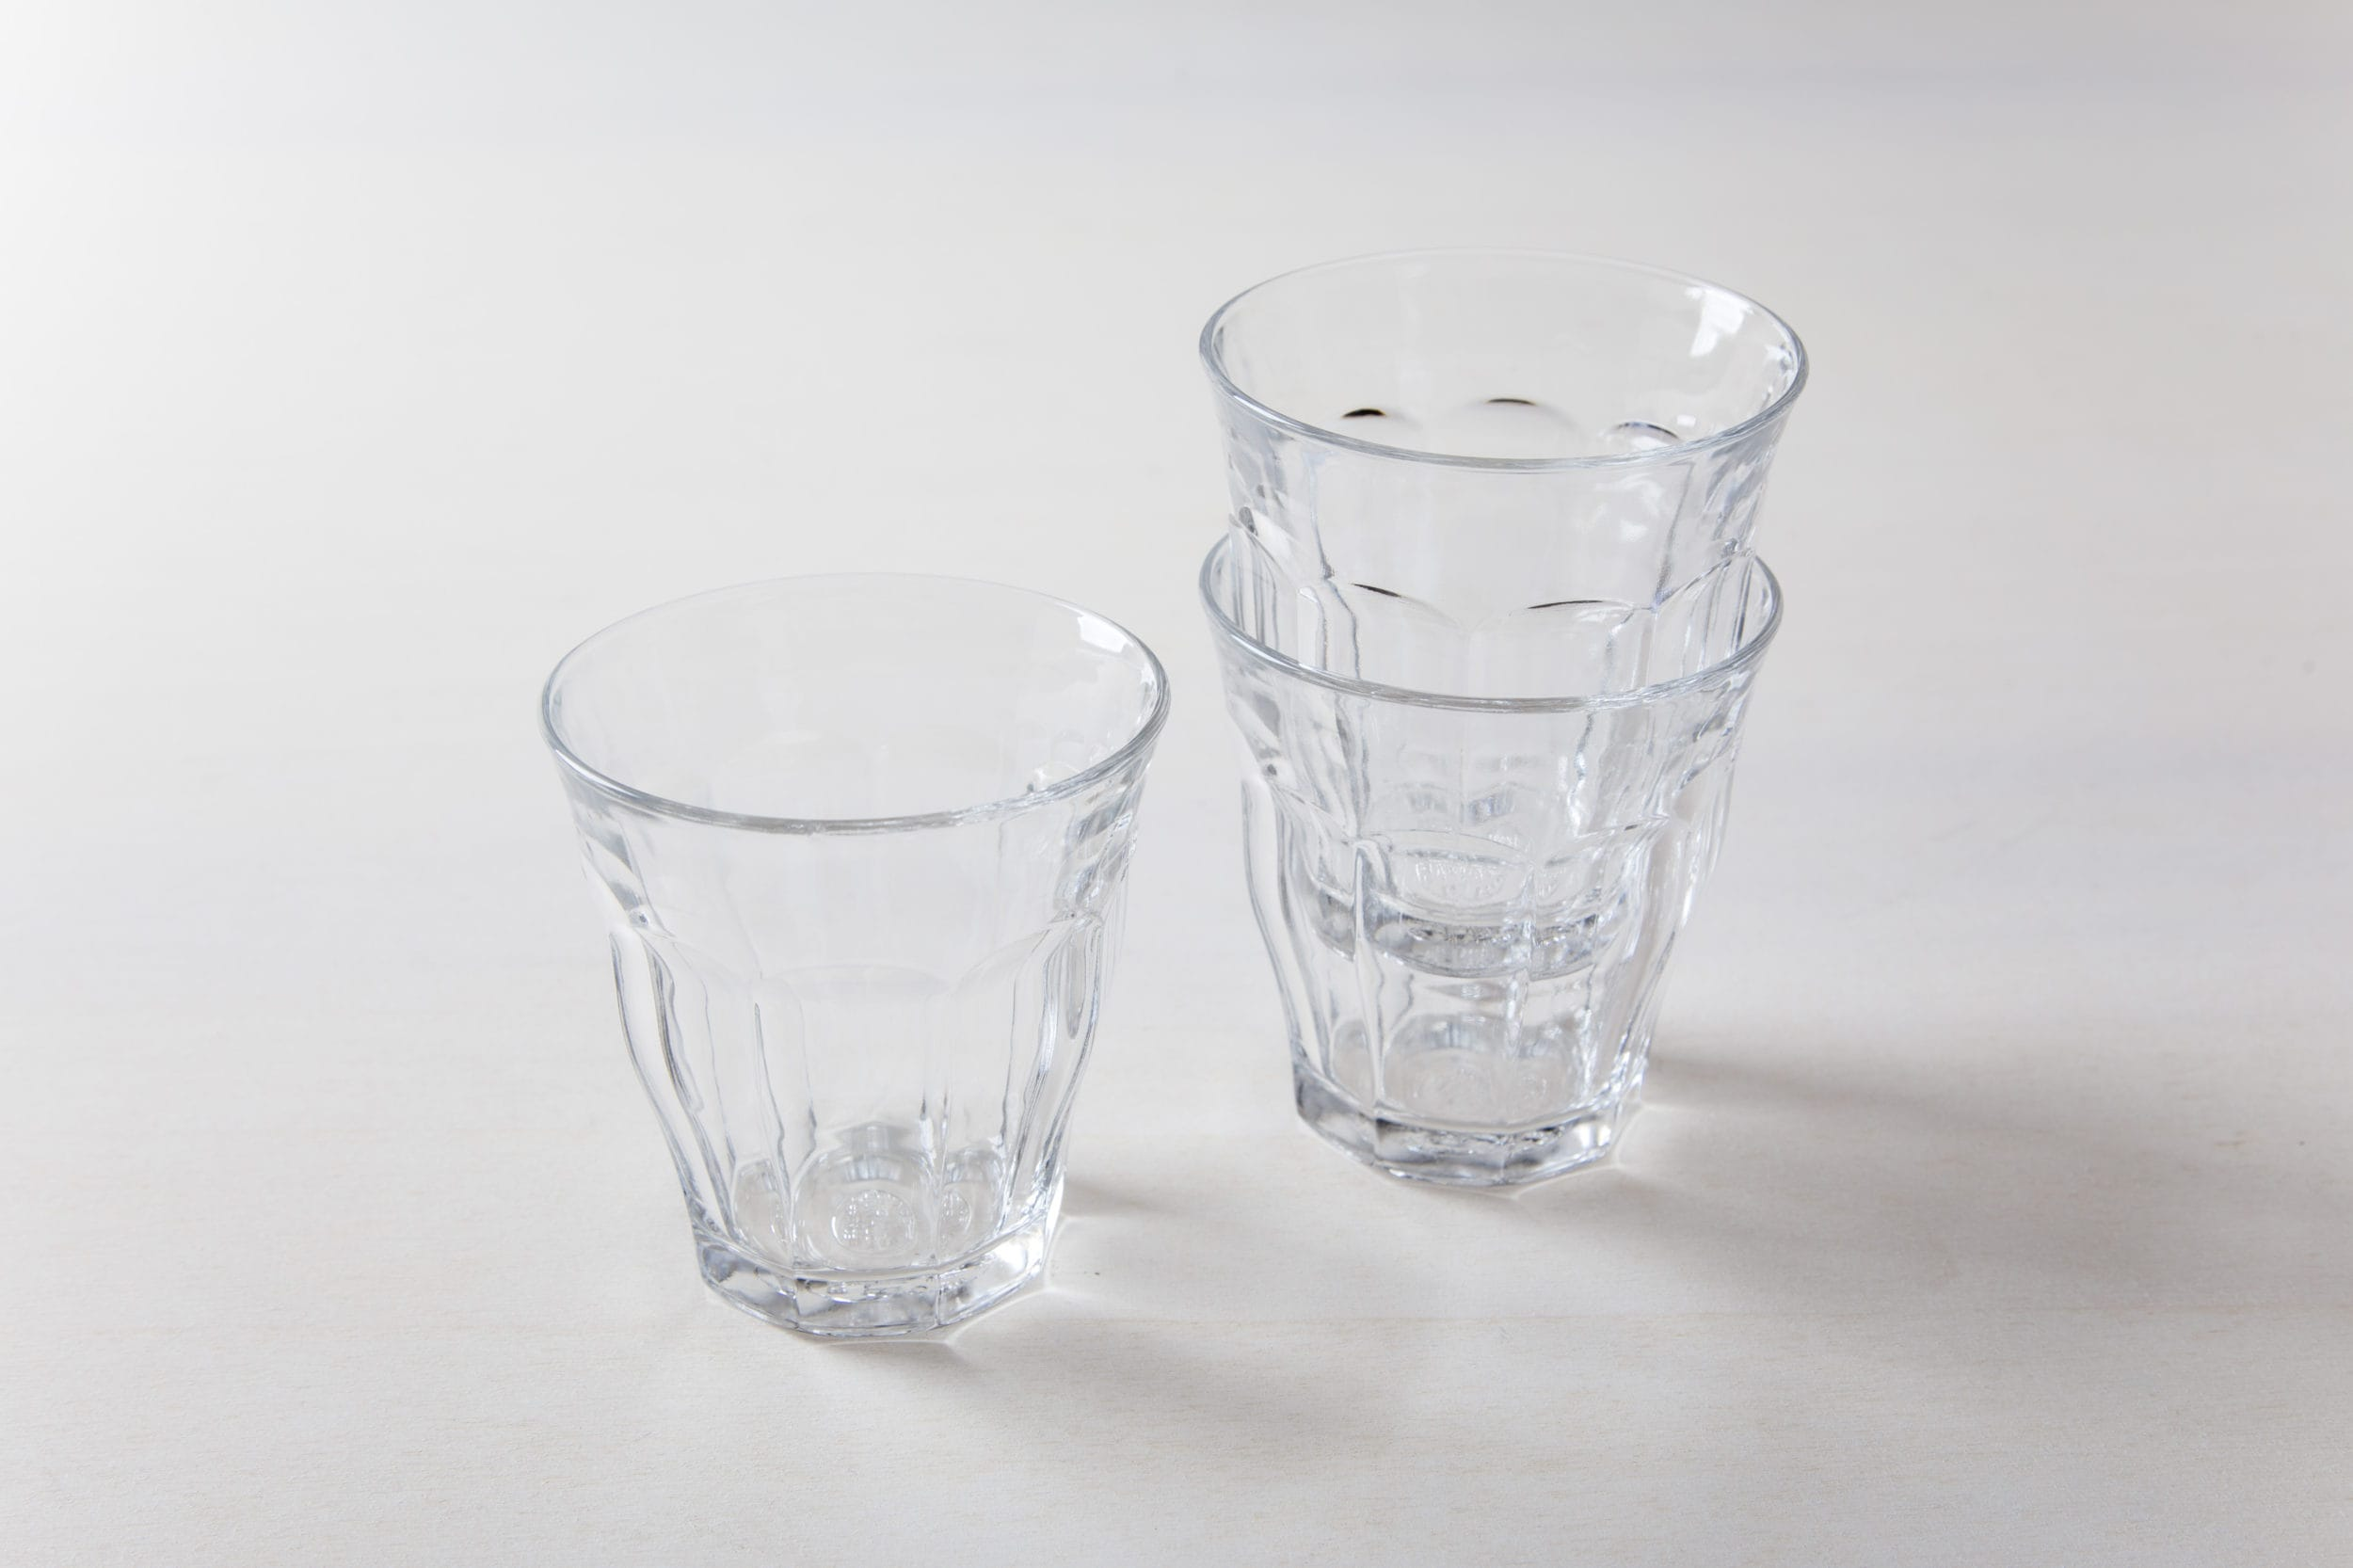 Picardie Glas, Wasserglas, Mieten, Hamburg, Berlin, Köln